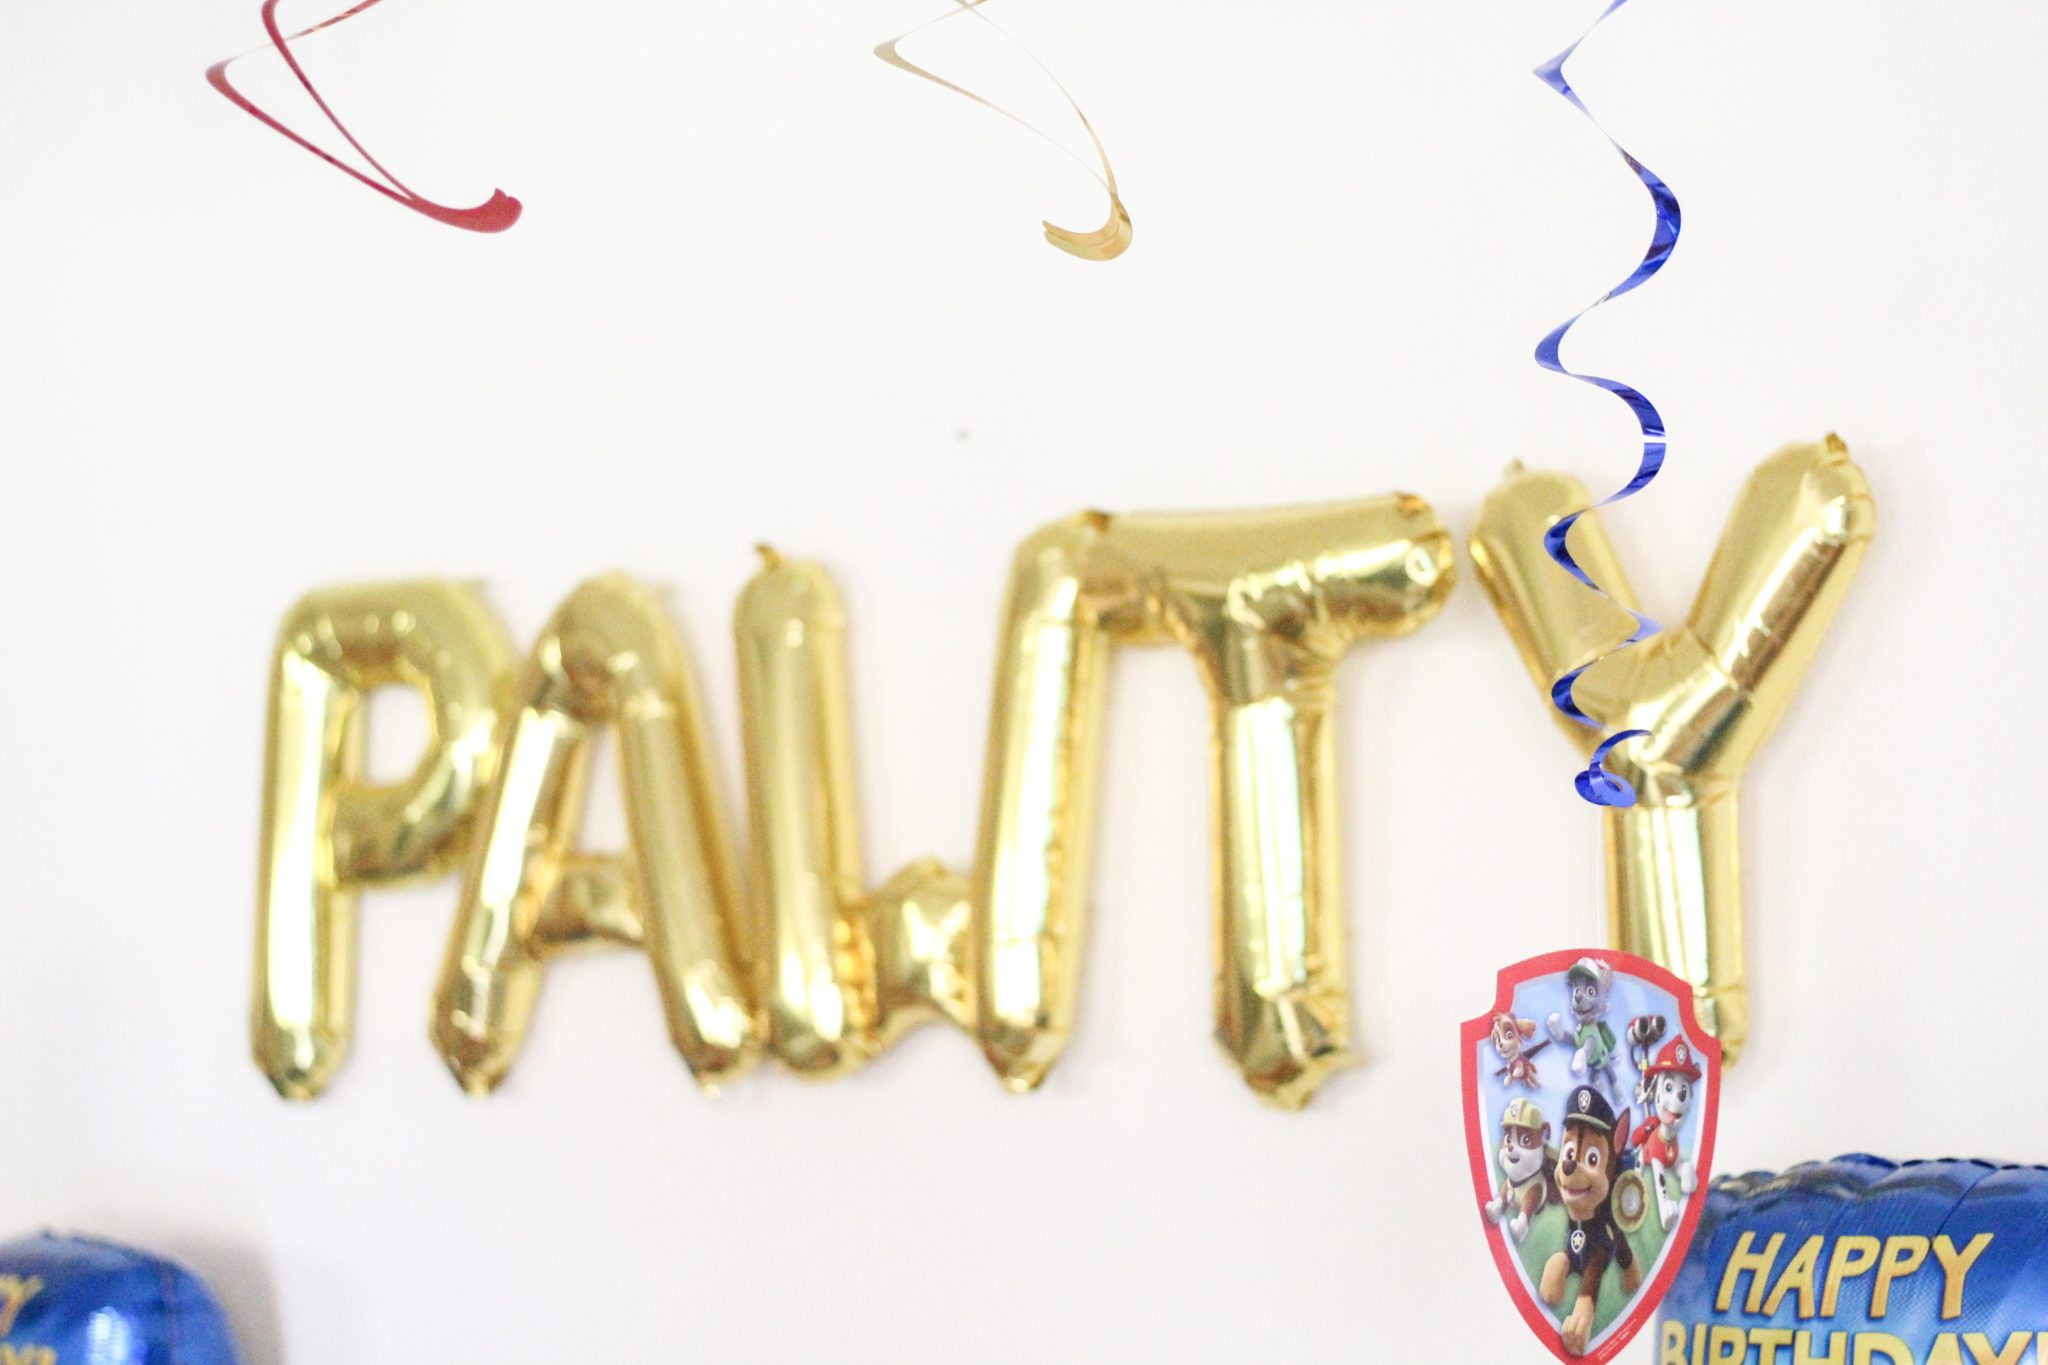 paw patrol birthday party, paw patrol supplies amazon, paw patrol party supplies target, paw patrol party supplies walmart, paw patrol dog bowls, paw patrol decorations, paw patrol ideas, paw patrol cake, paw patrol birthday party for boys, paw patrol birthday party for girls